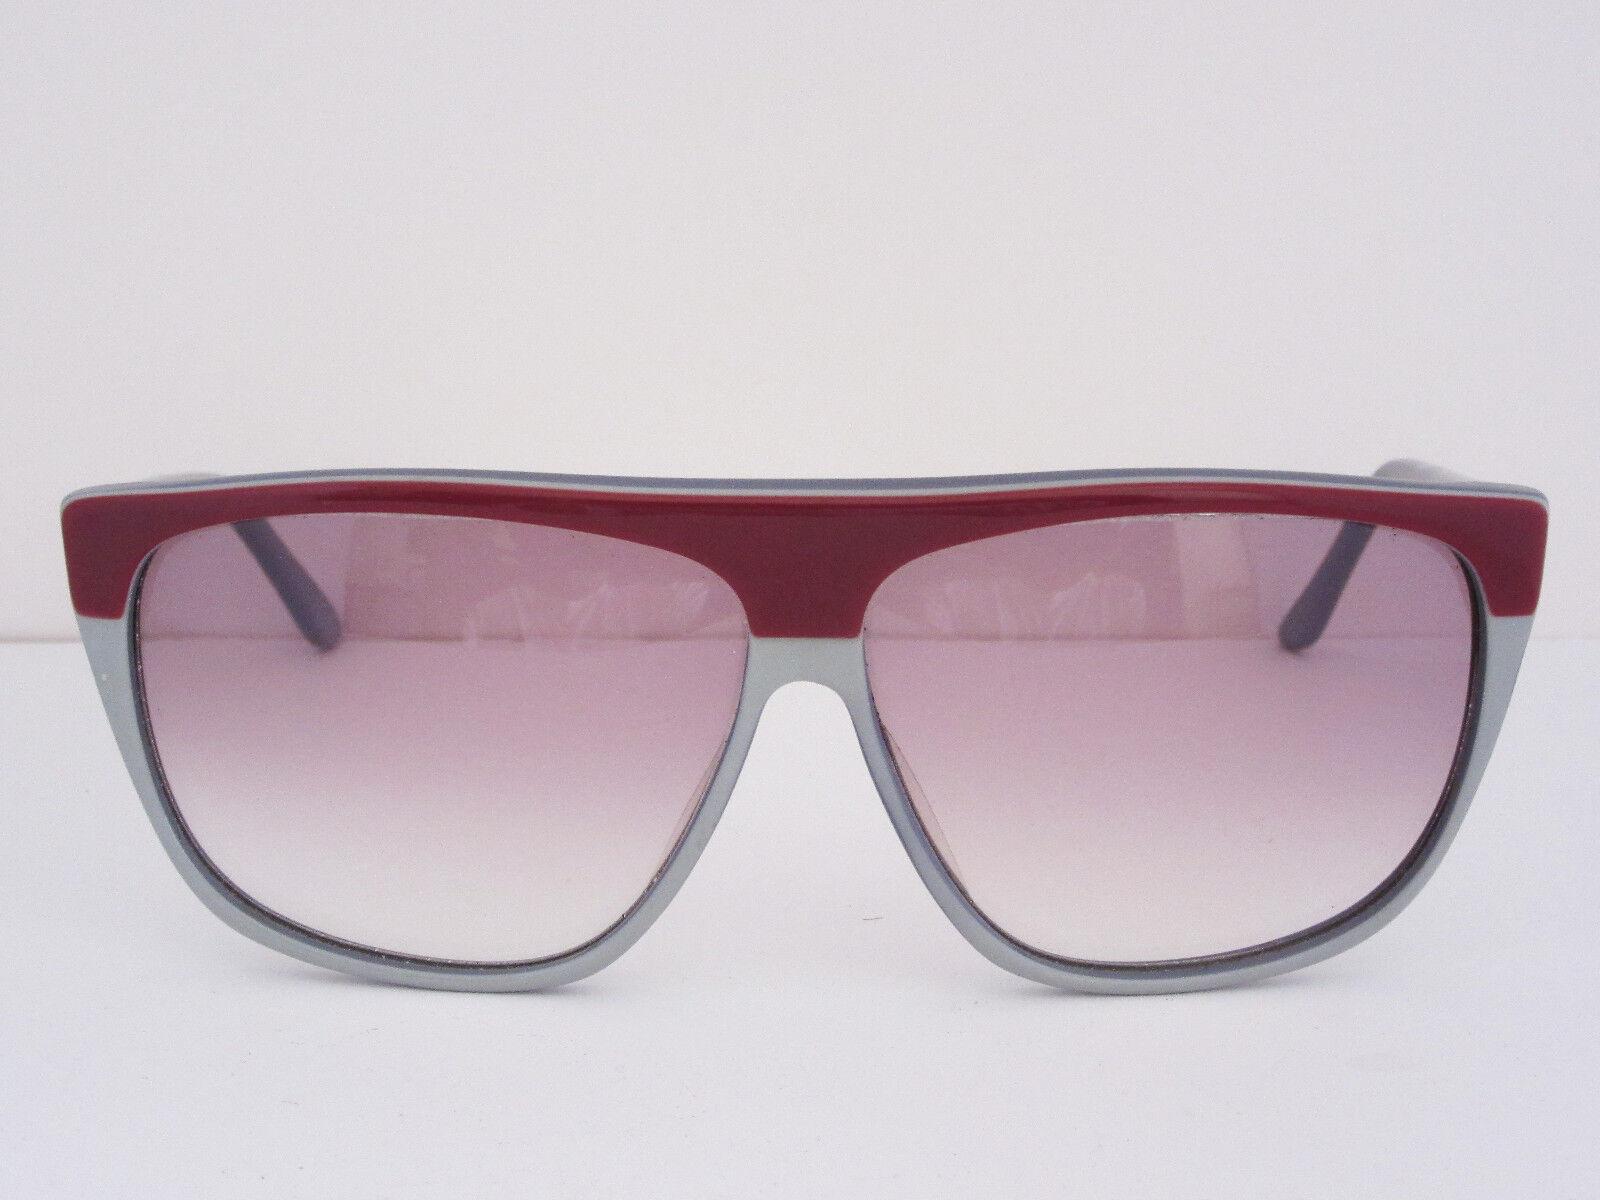 Oleg cassini fashion sunglasses 99